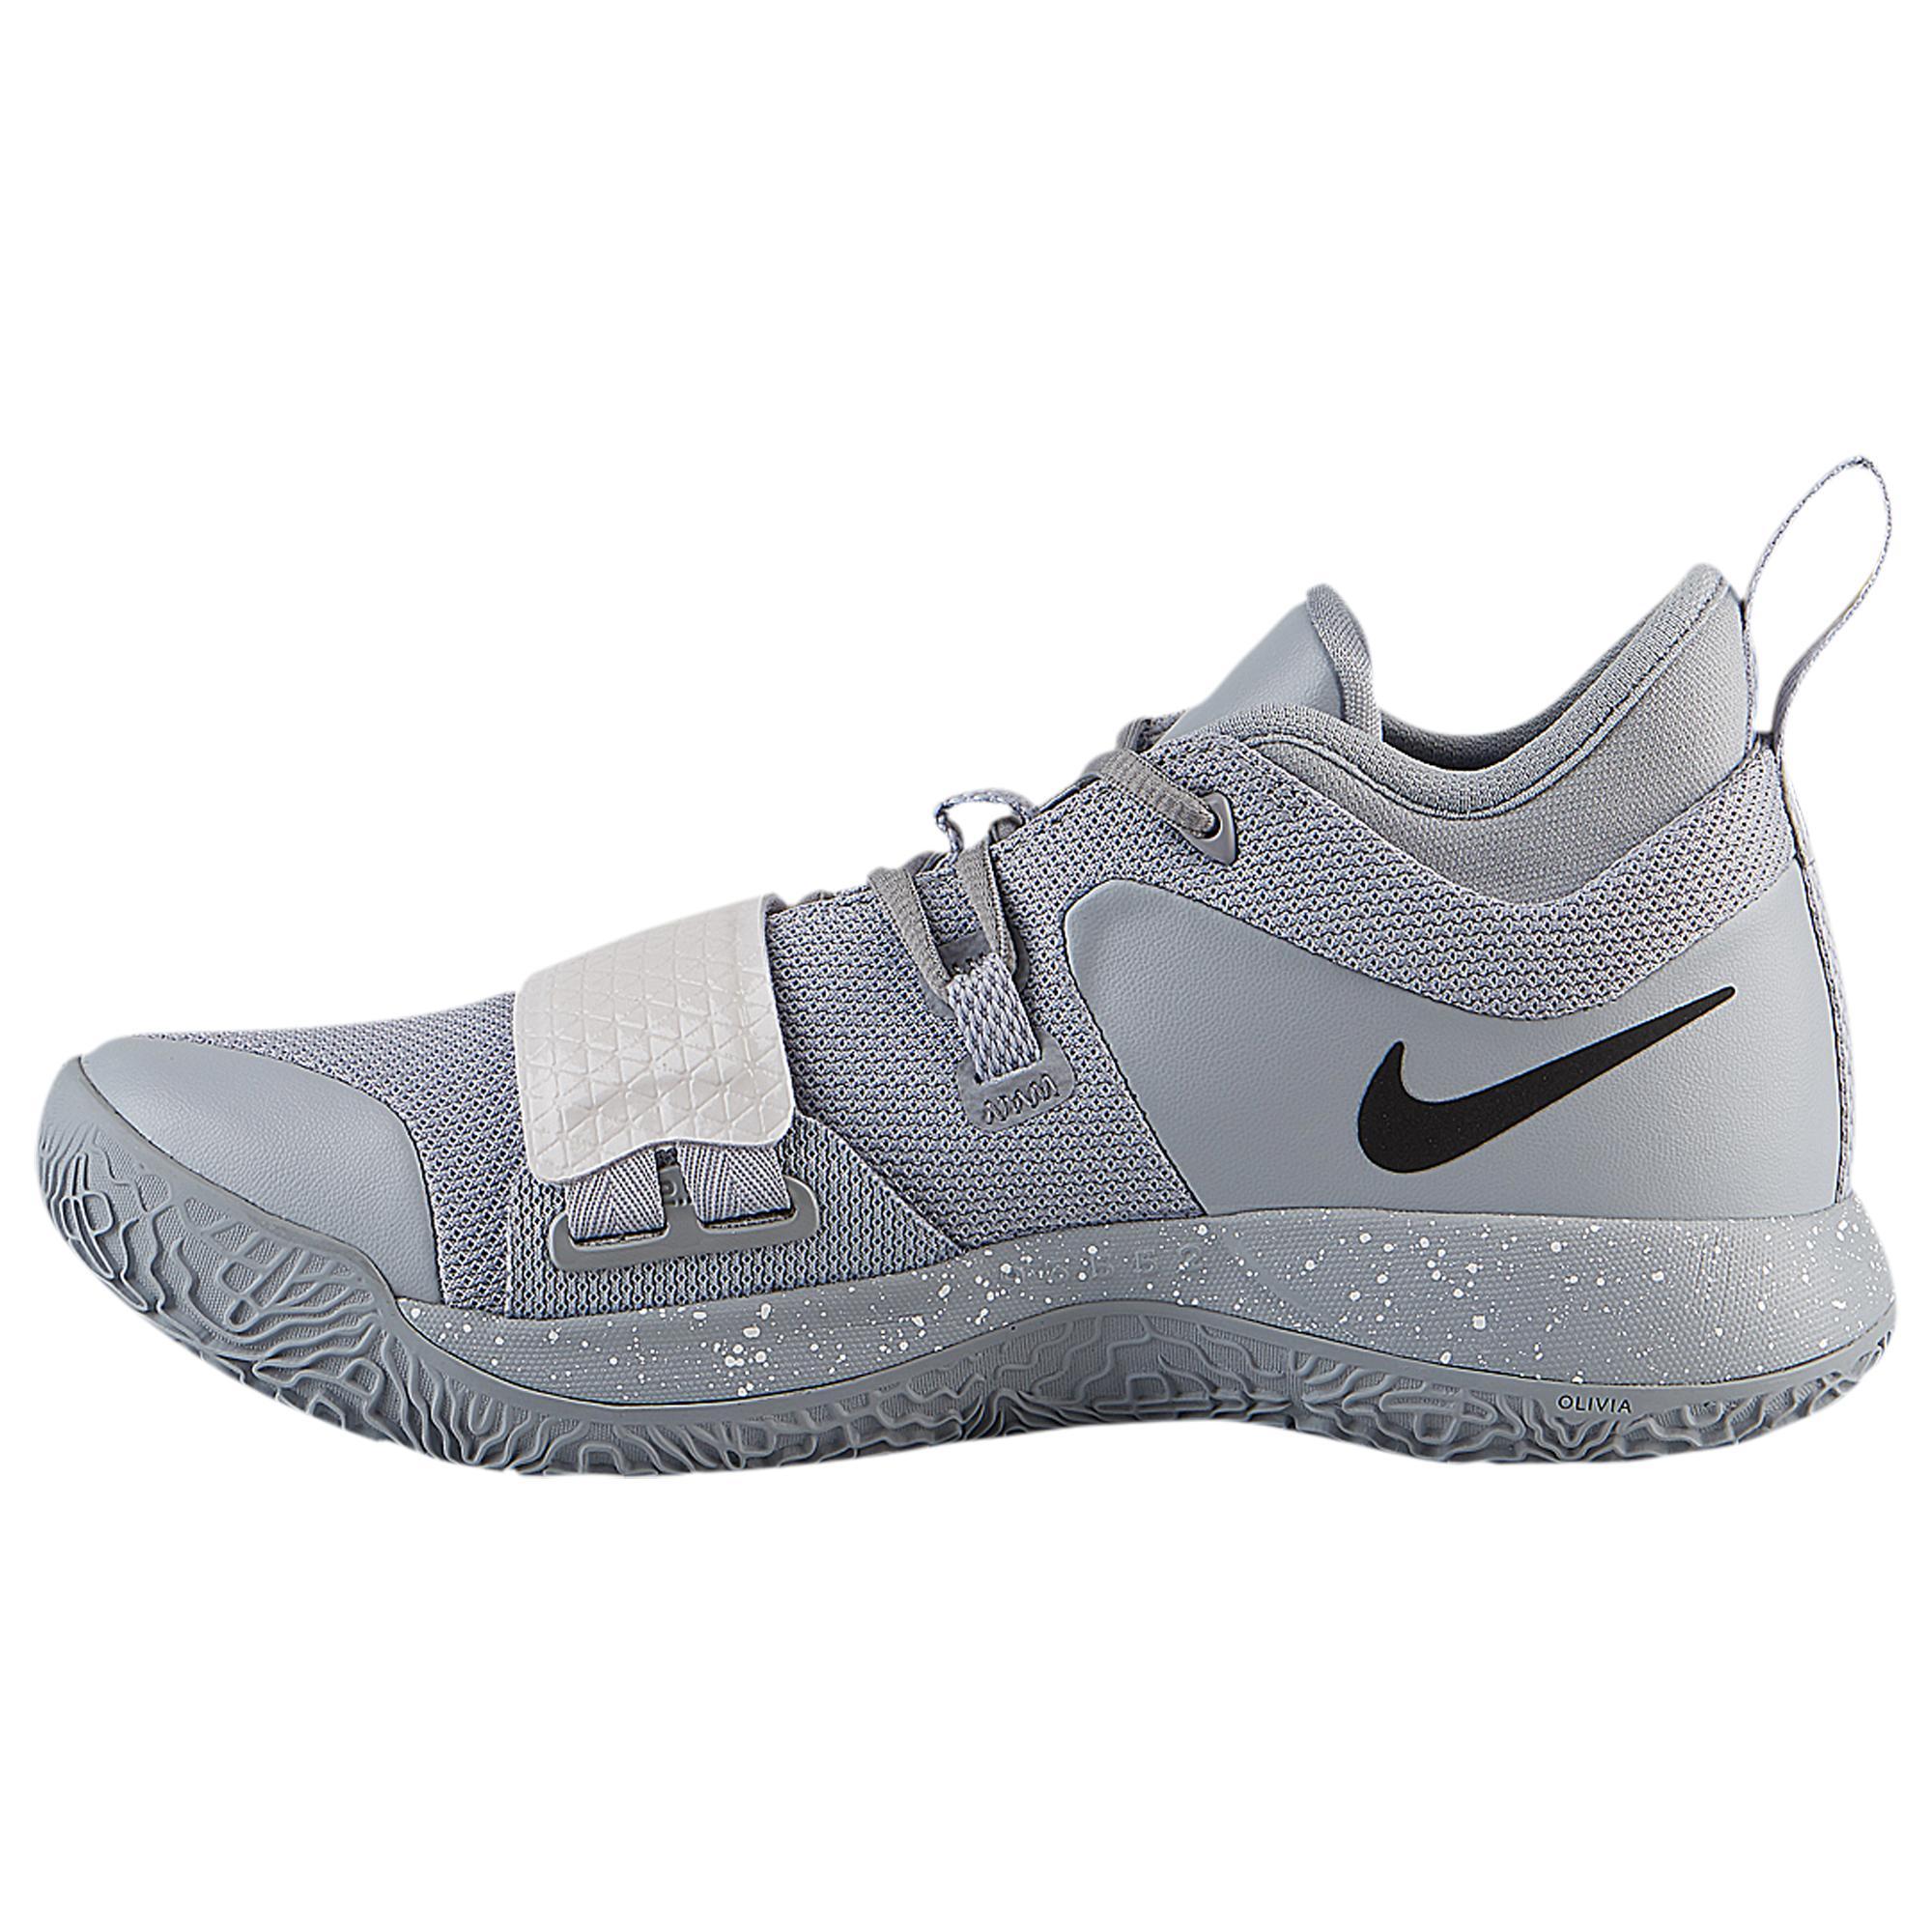 huge selection of 49003 c70fd Men's Gray Pg 2.5 Basketball Shoes